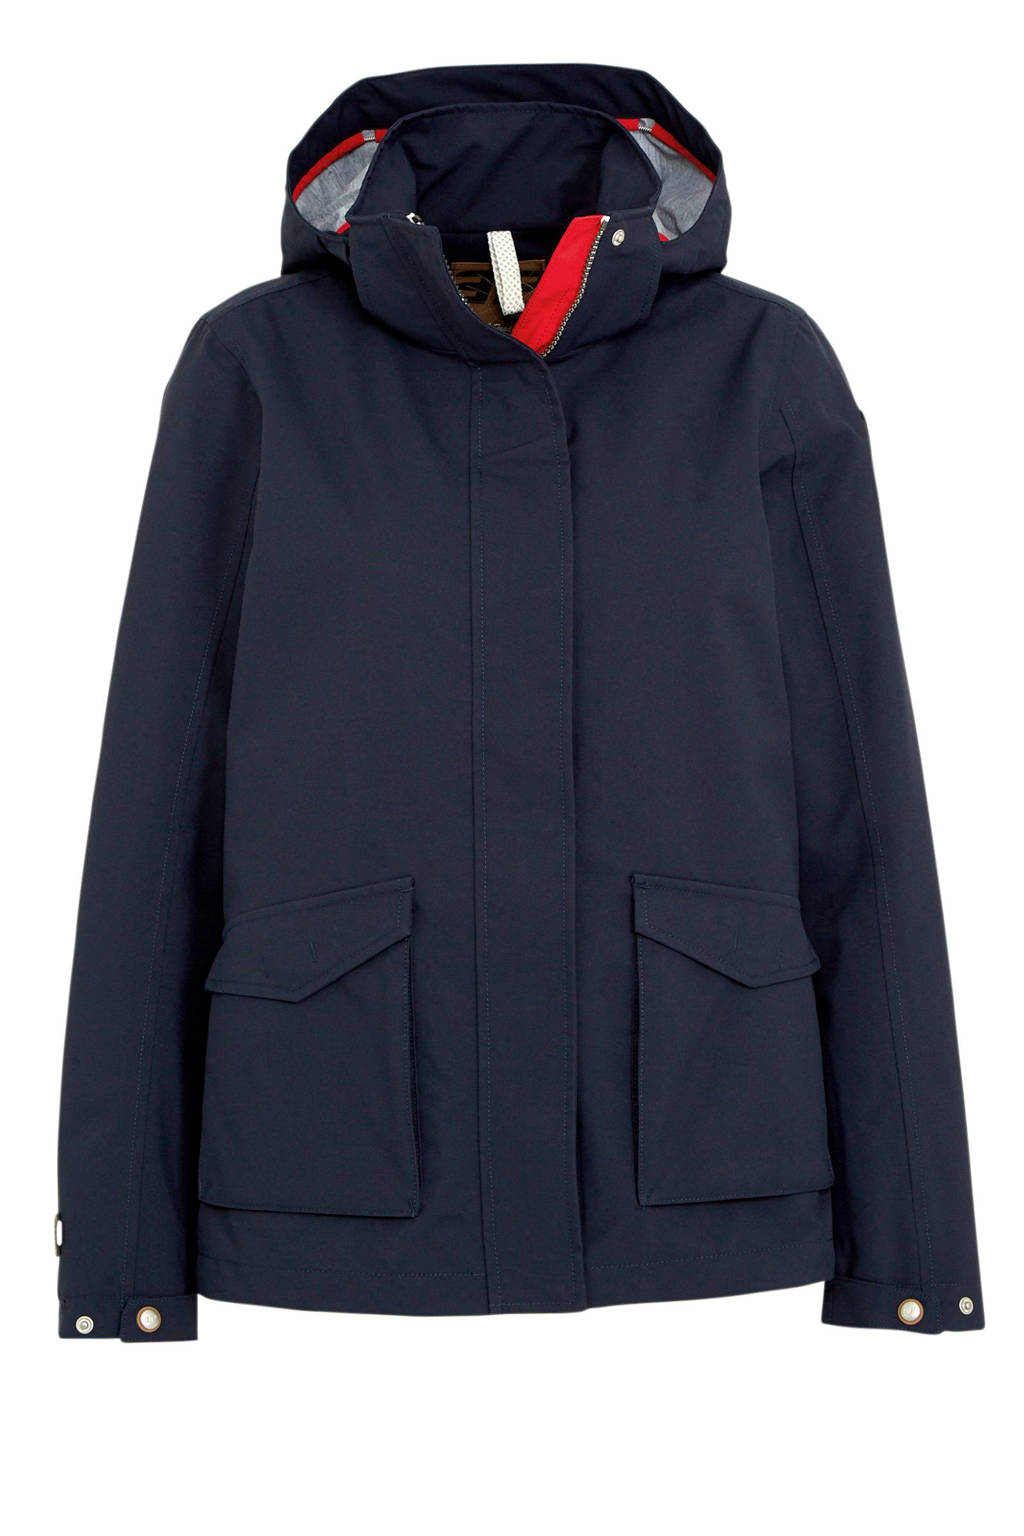 Icepeak outdoor jas Alameda donkerblauw, Donkerblauw